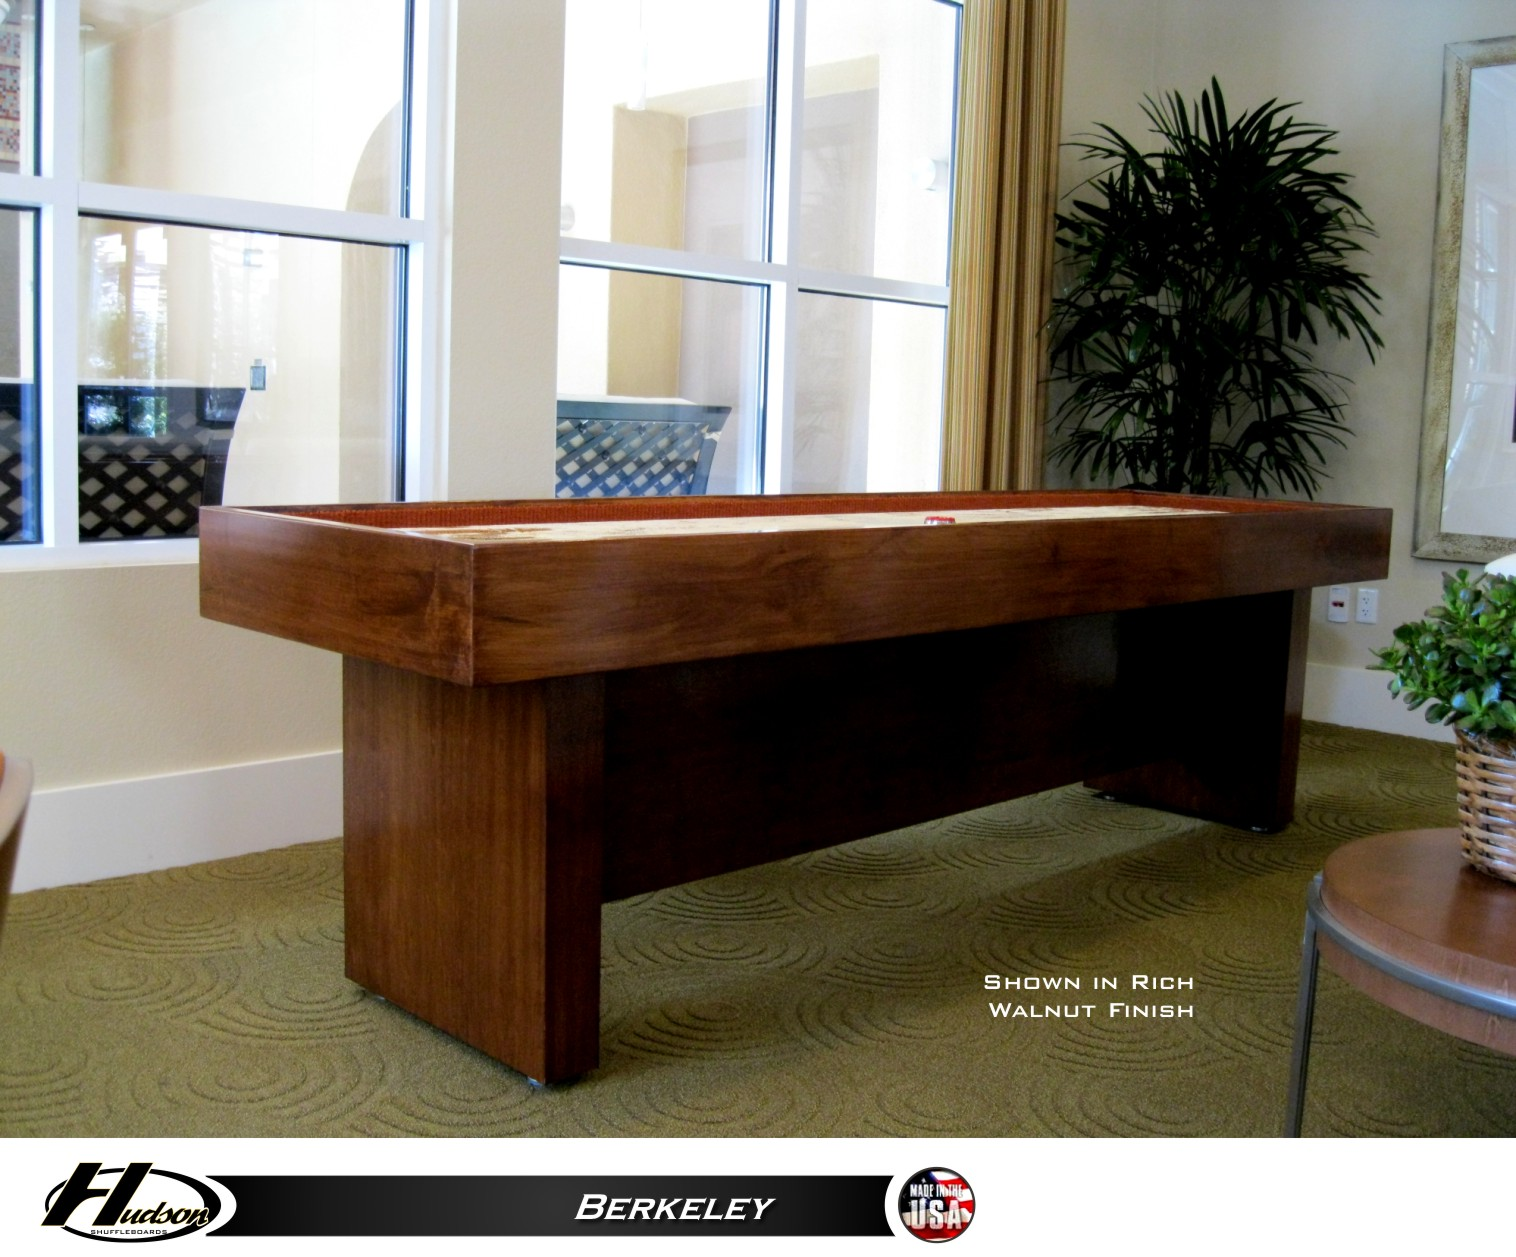 Berkeley Shuffleboard Table Shuffleboardnet - 12 foot shuffleboard table for sale